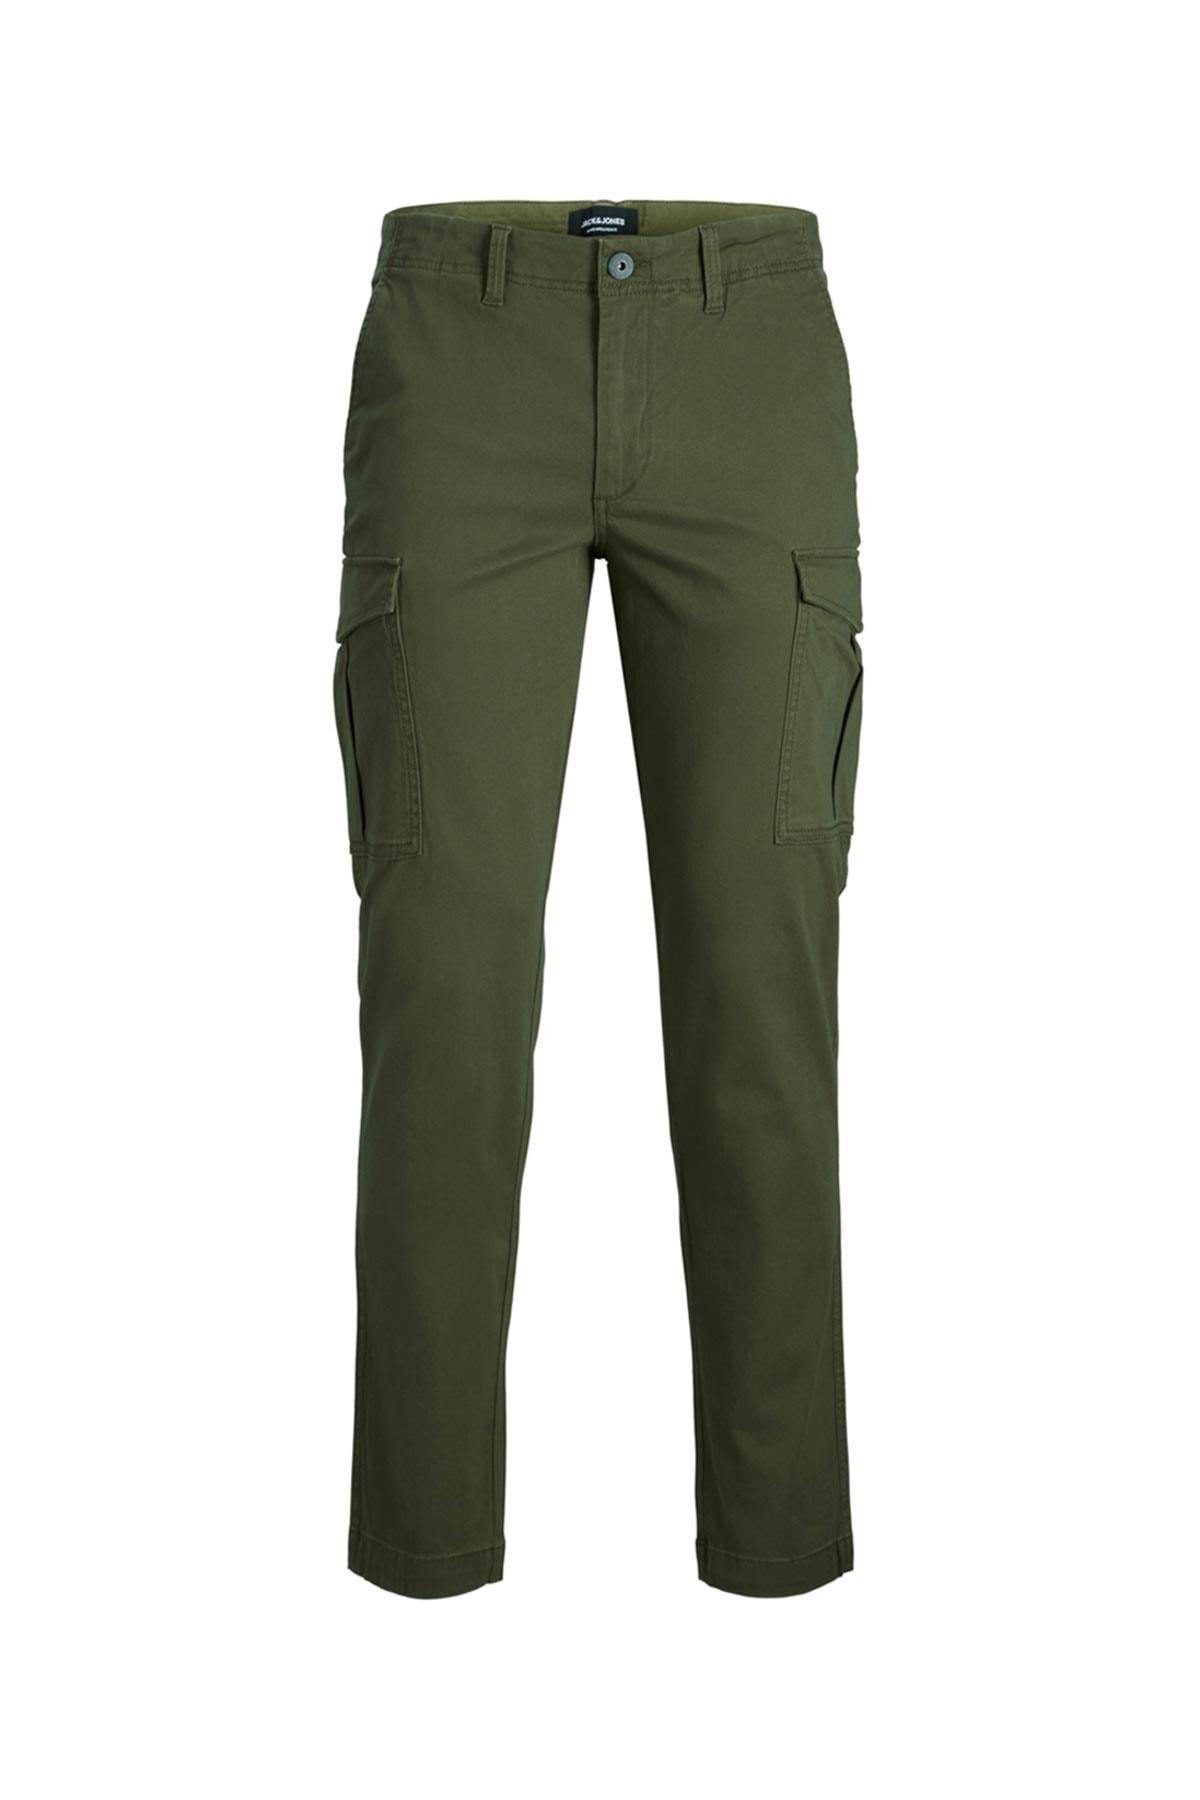 Jack & Jones Erkek Kargo Pantolon 12174184 1